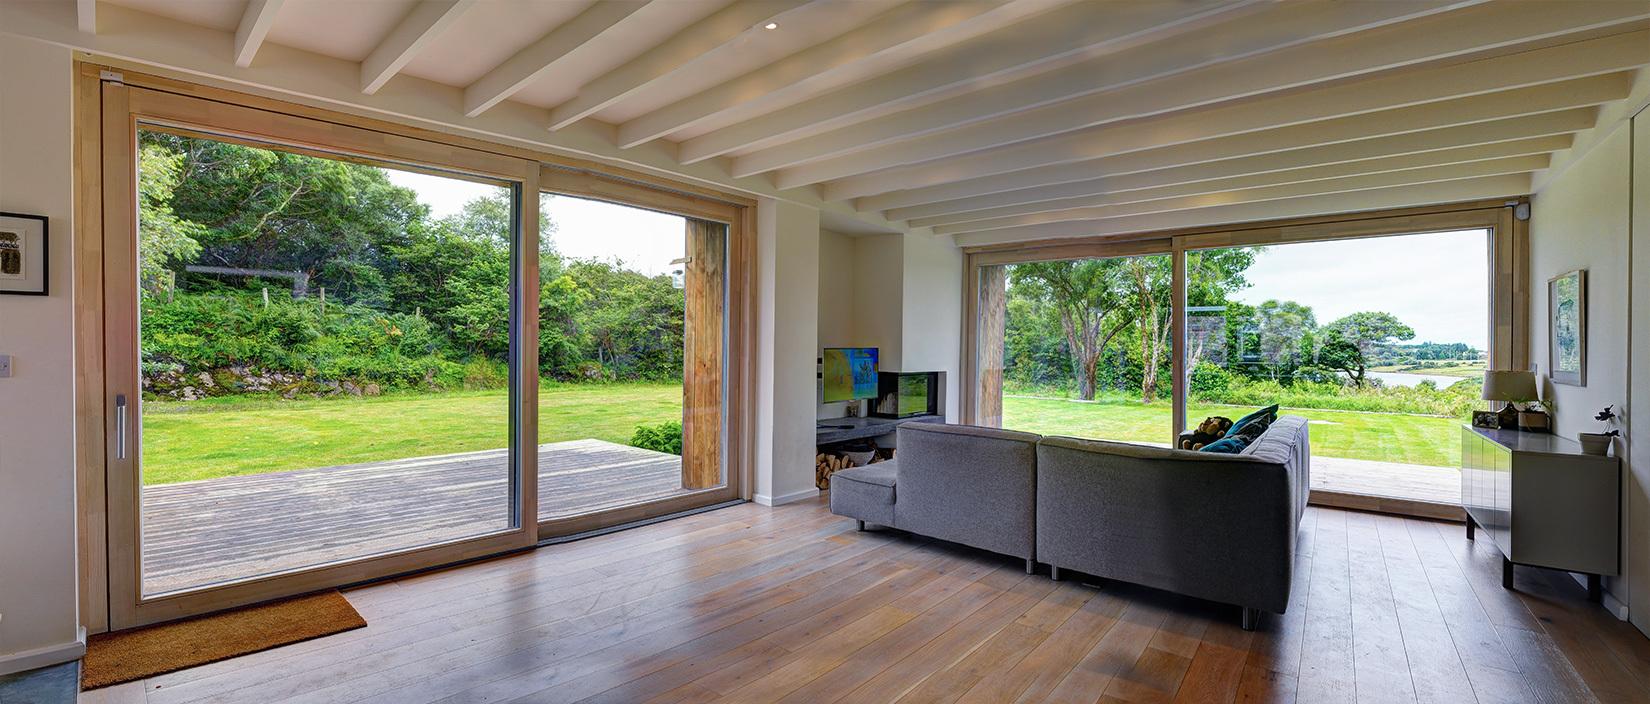 Accoya wonder wood for windows